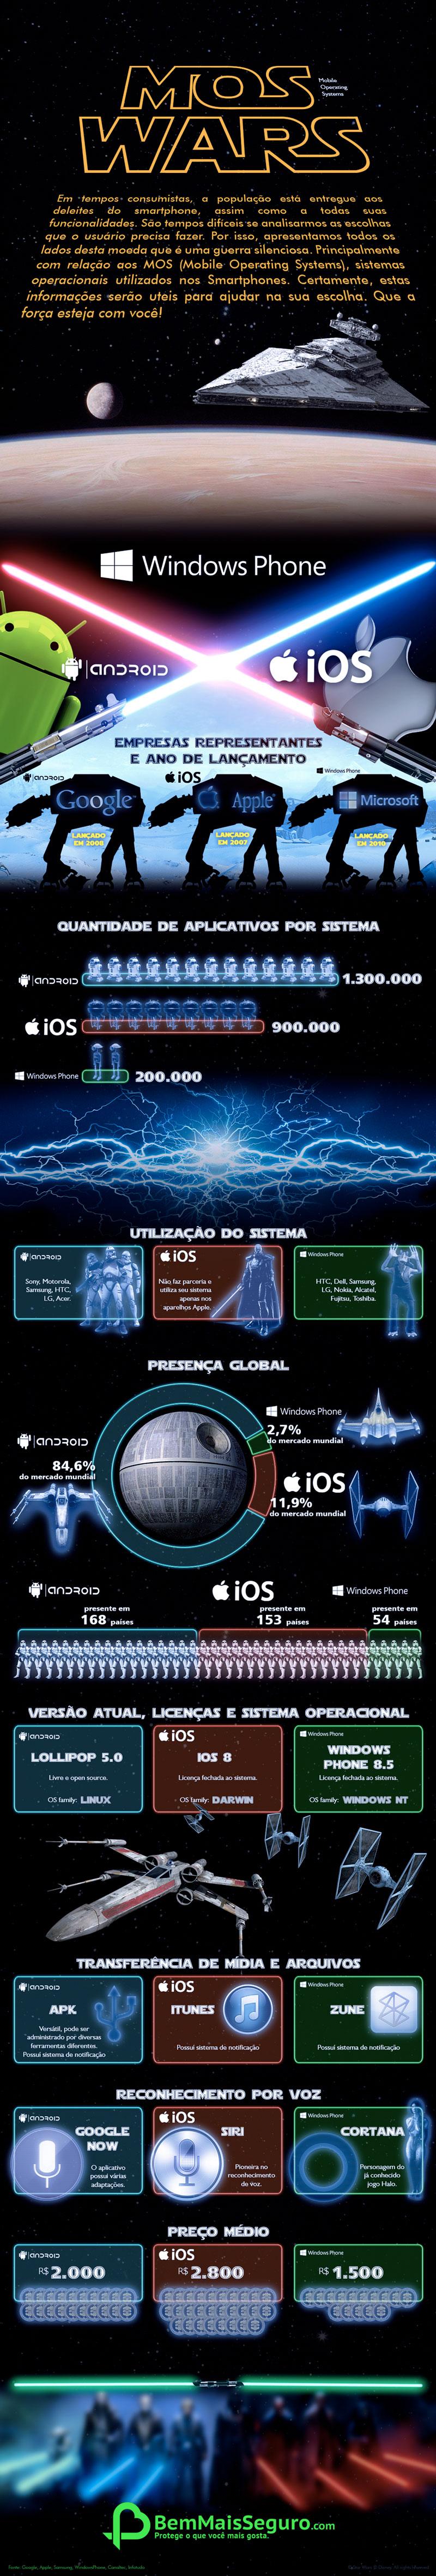 20141110_infografico_bms_v05